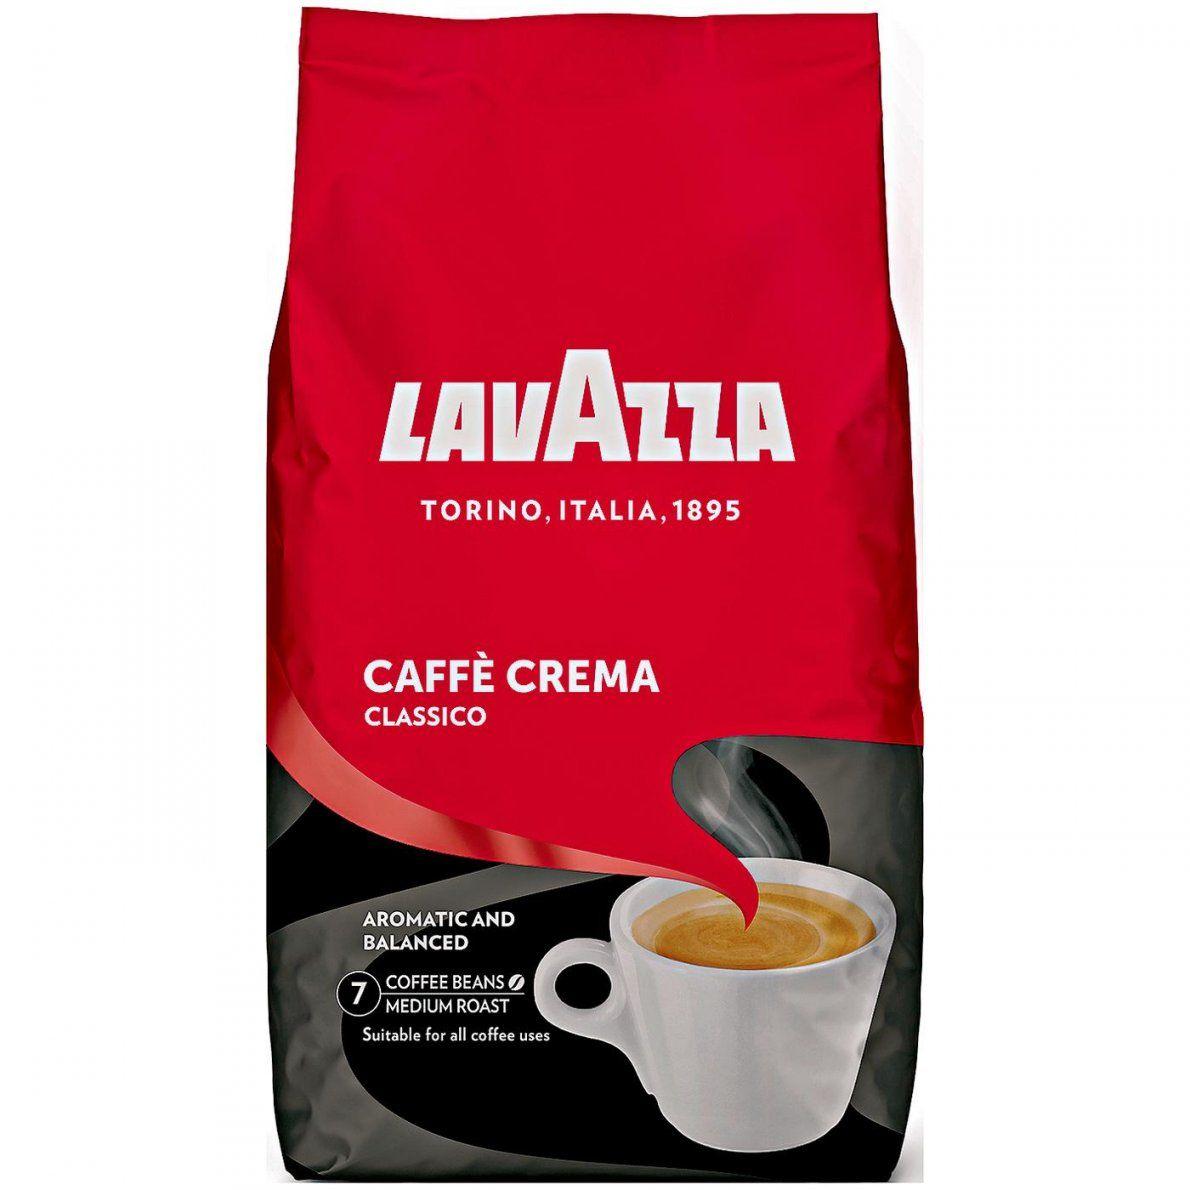 Lavazza Caffè Crema Classico Online Günstig Kaufen  Rossmann von Lavazza Crema Classico Angebot Photo